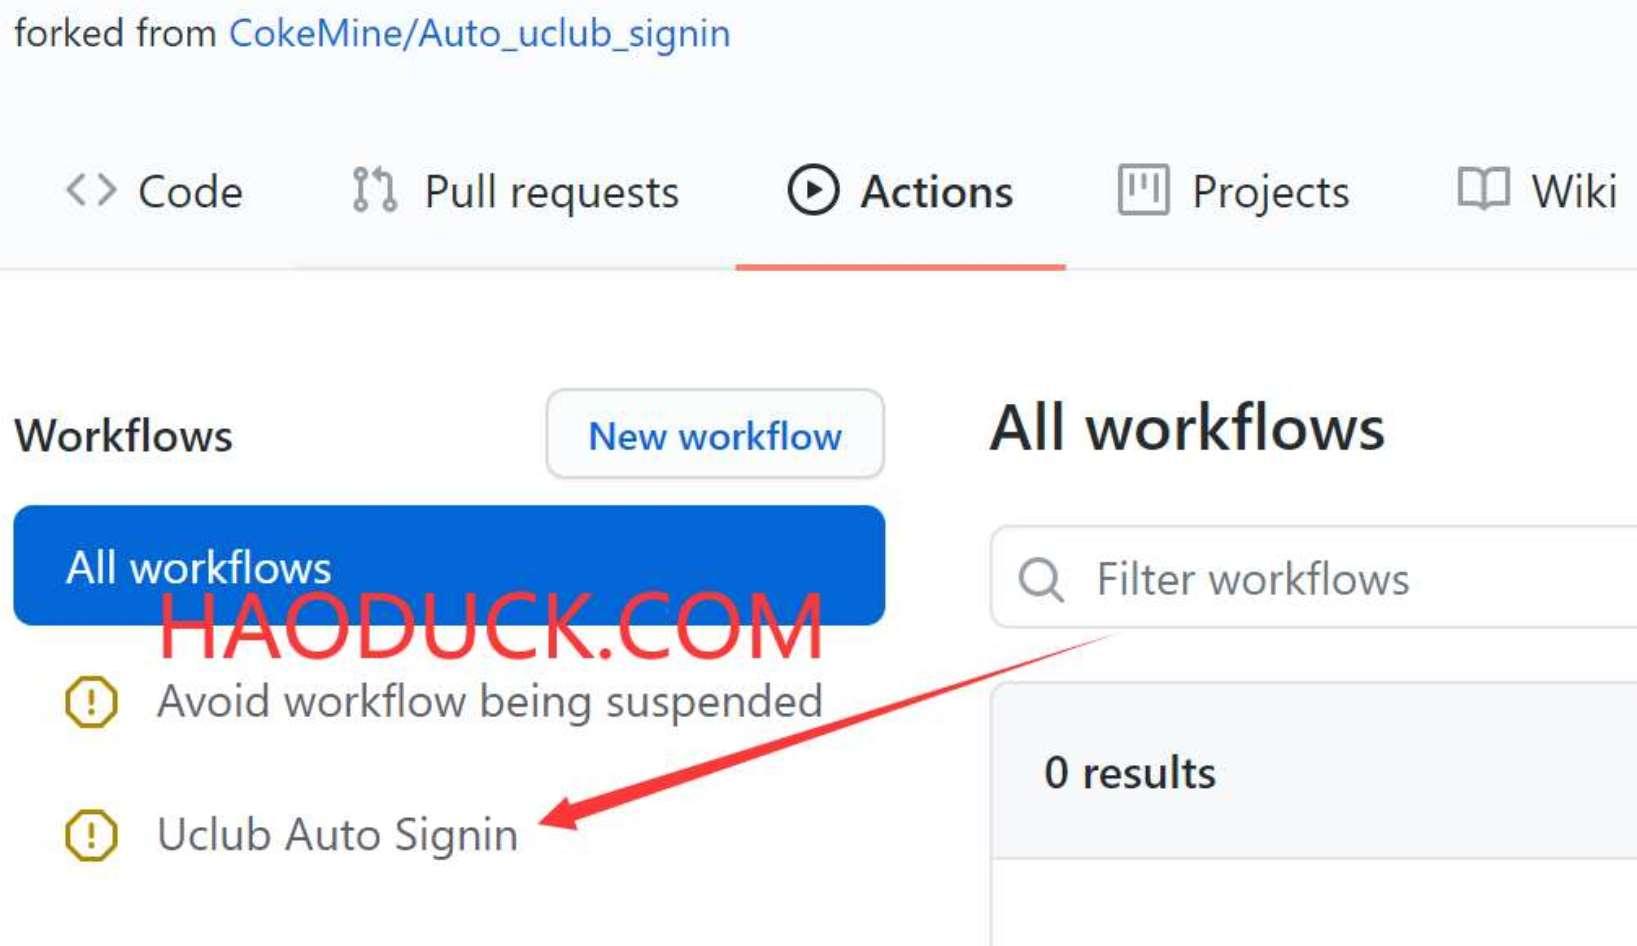 UCloud社区使用GitHub Action自动签到获取积分,可以免费兑换T恤、保温杯等实物